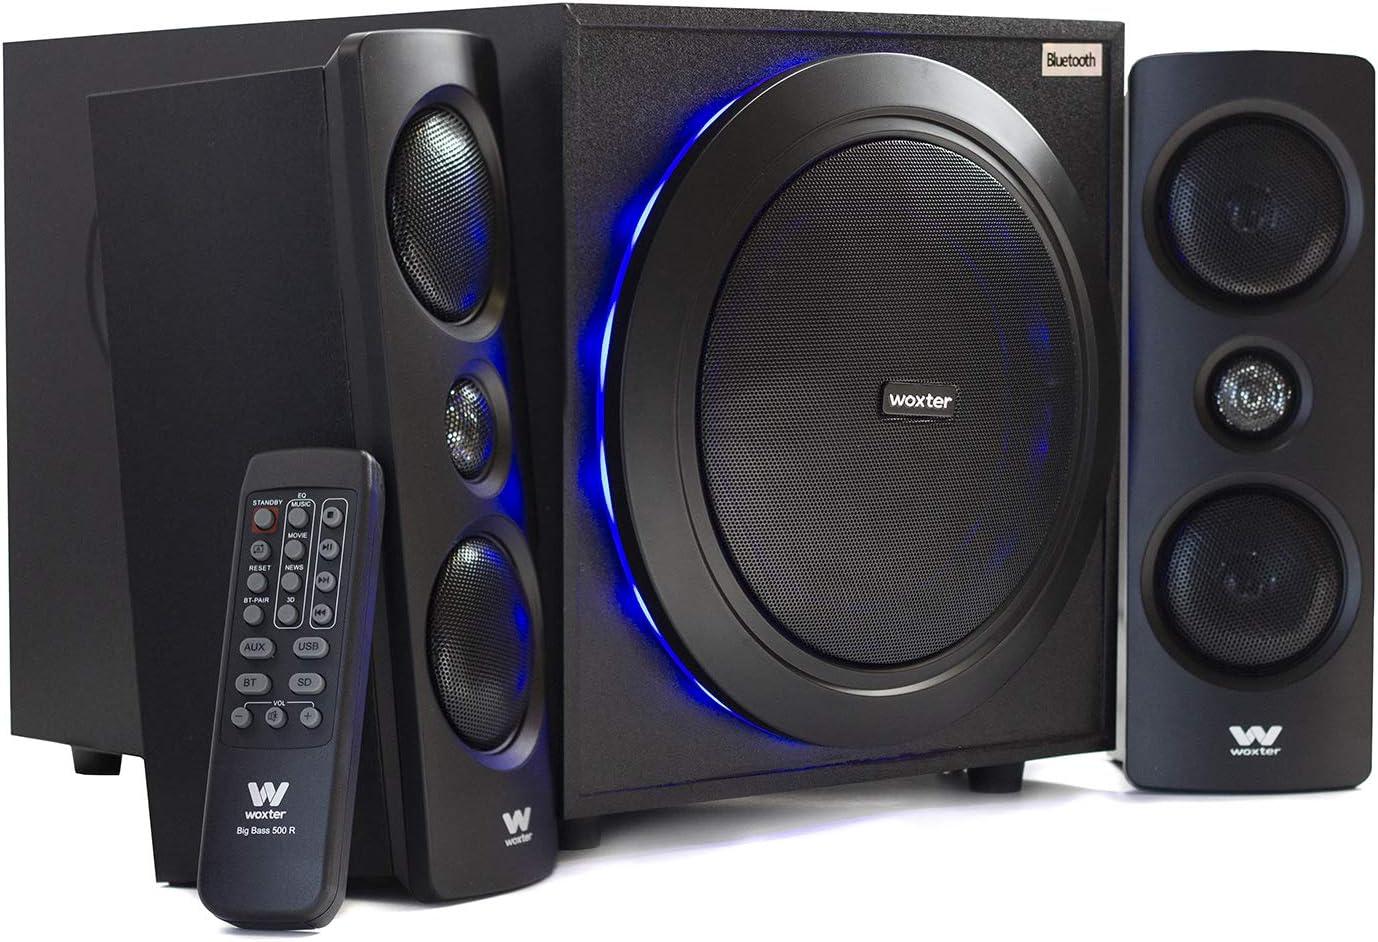 Woxter Big Bass 500 R - Altavoces 2.1, 150W BLUETOOTH, LEDS, Subwoofer de MADERA, Conexión de Auriculares y Jack de 3.5mm para Conectar Dispositivos